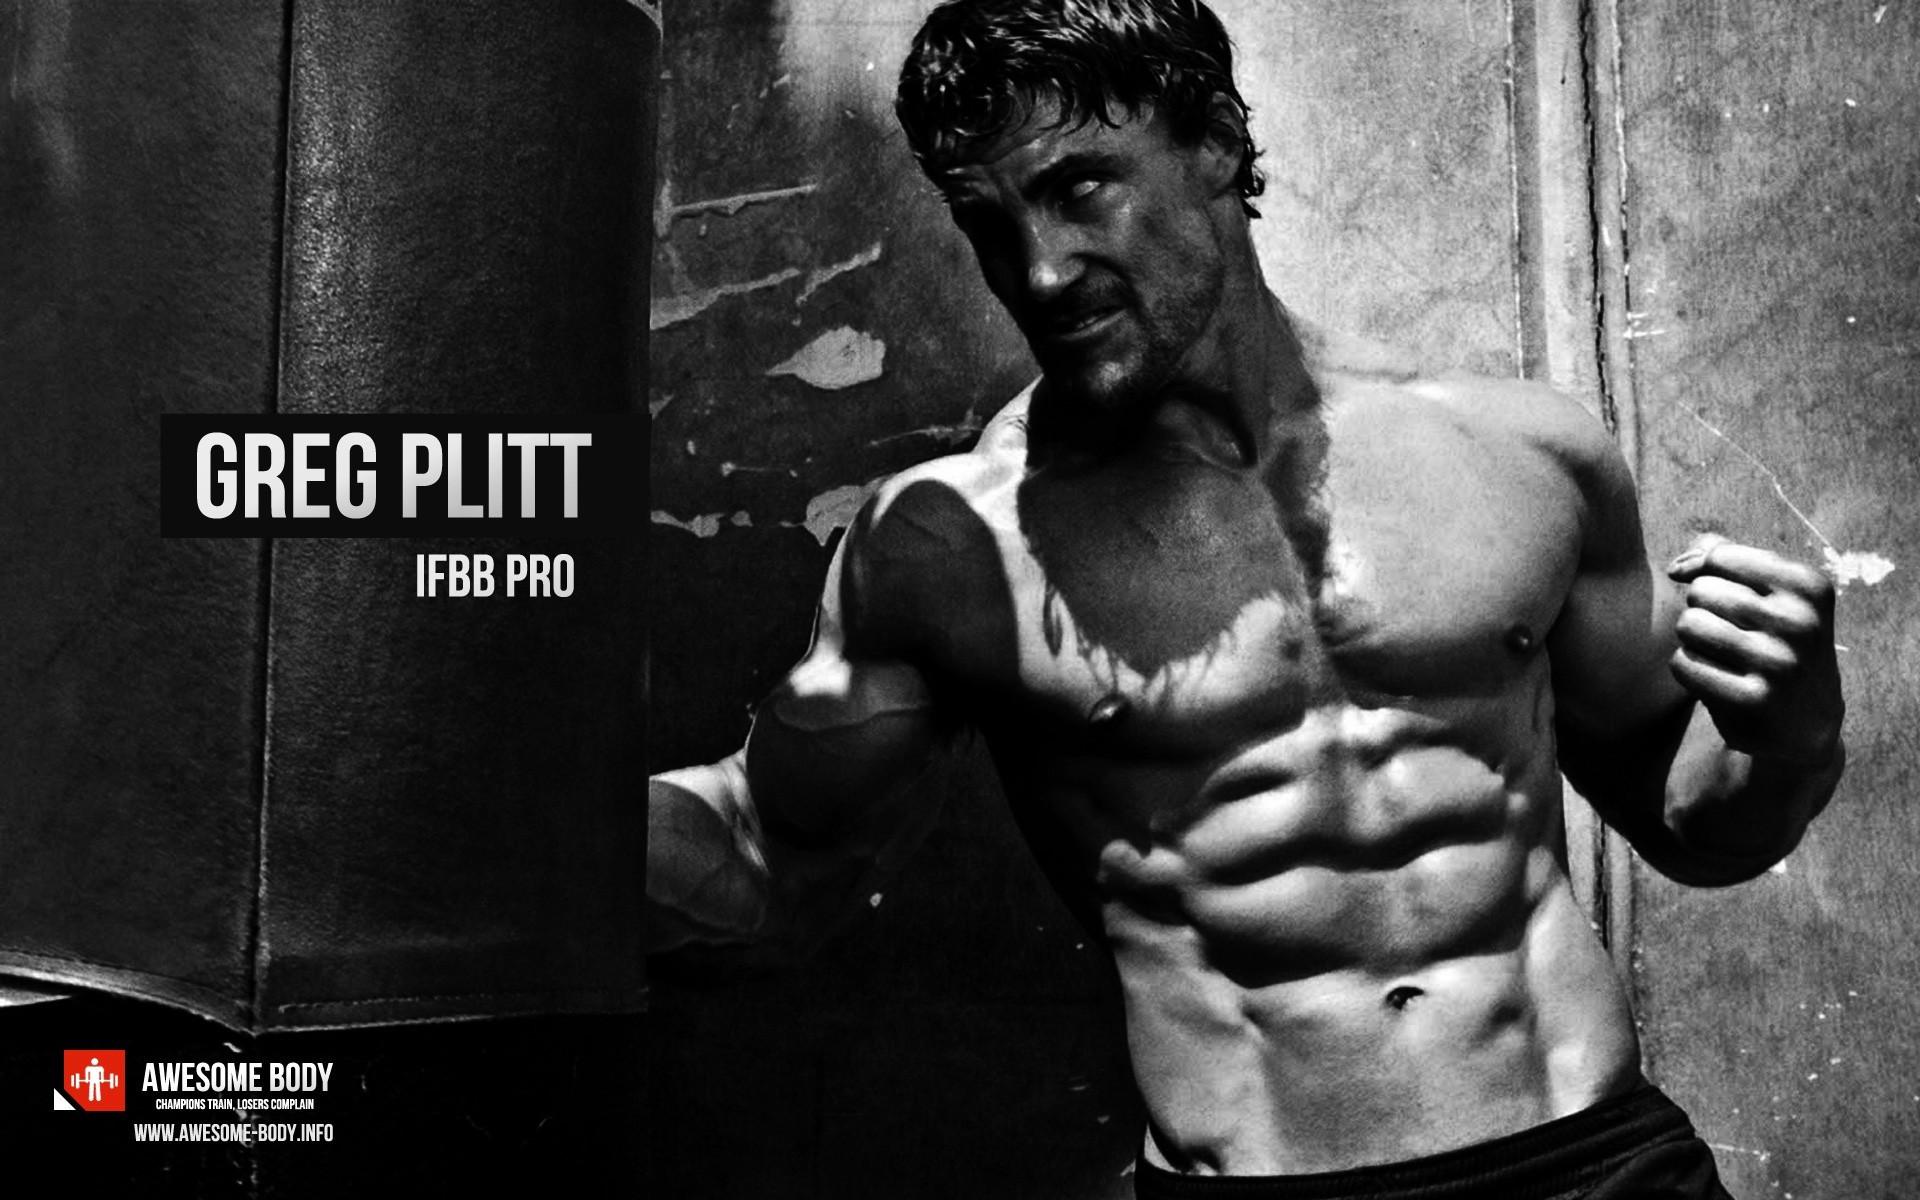 Greg Plitt Wallpaper Download | American fitness model and actor